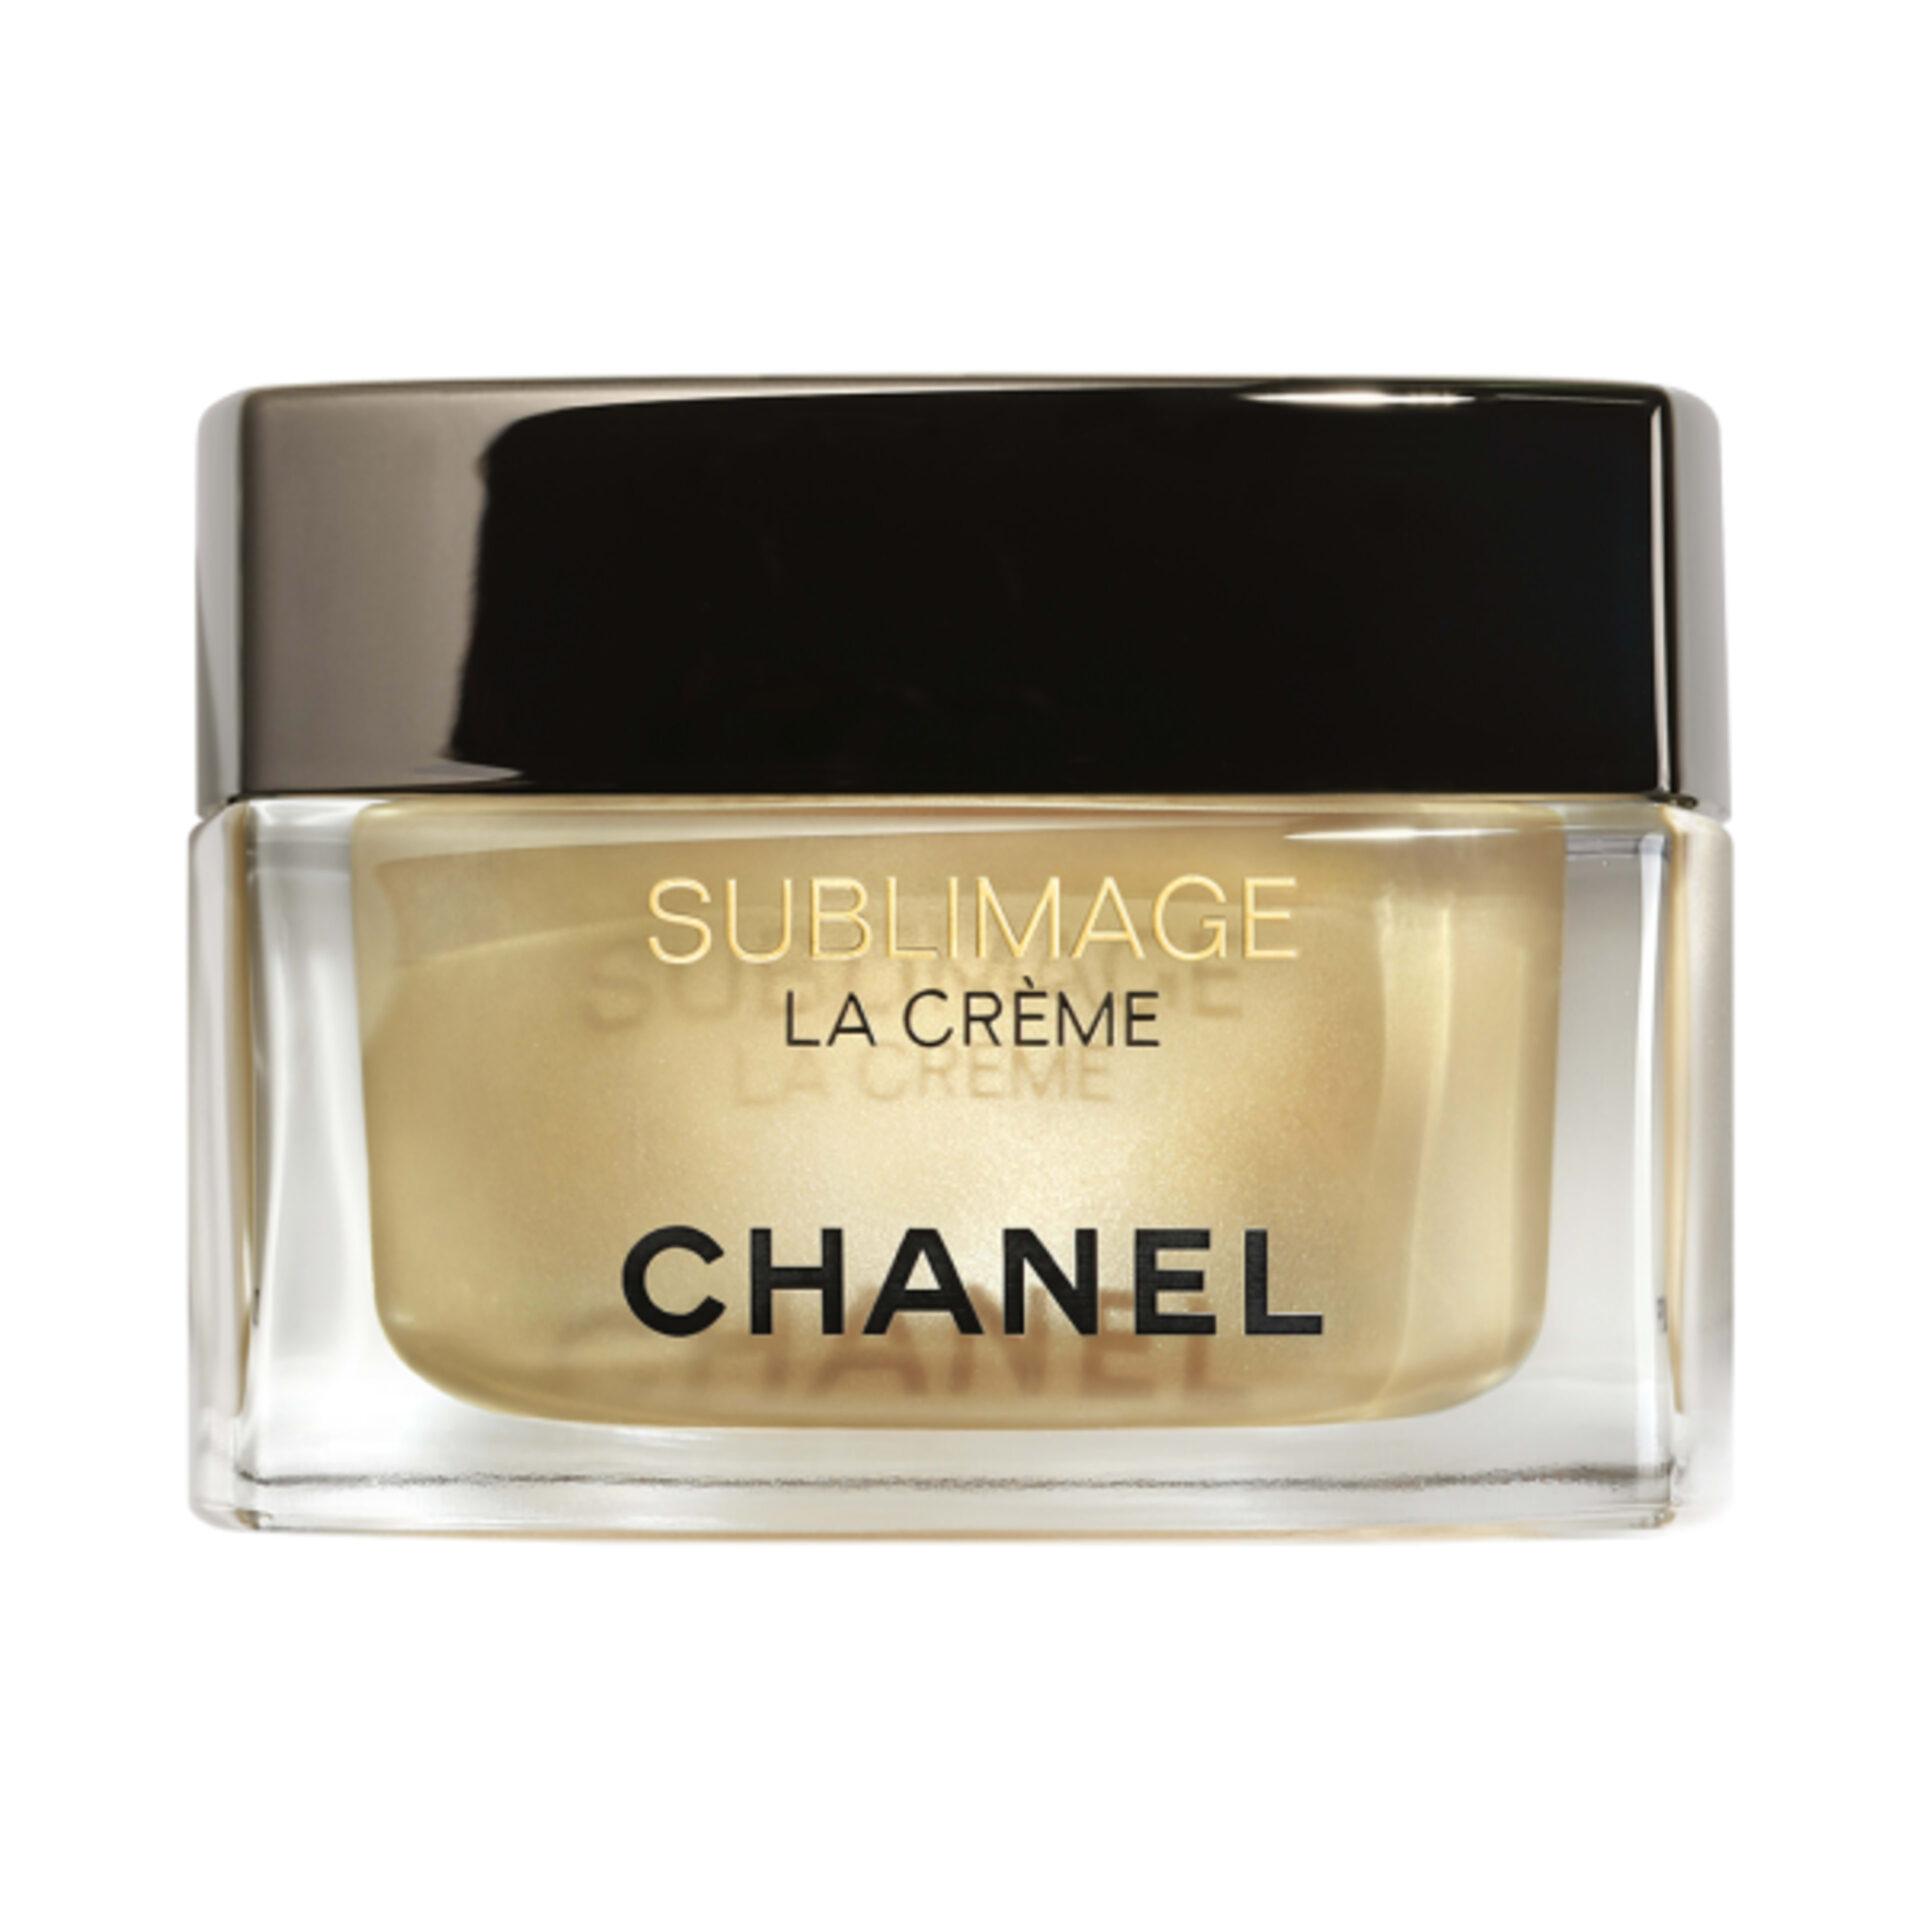 Chanel Sublimage La Crème - gift ideas for skincare addicts